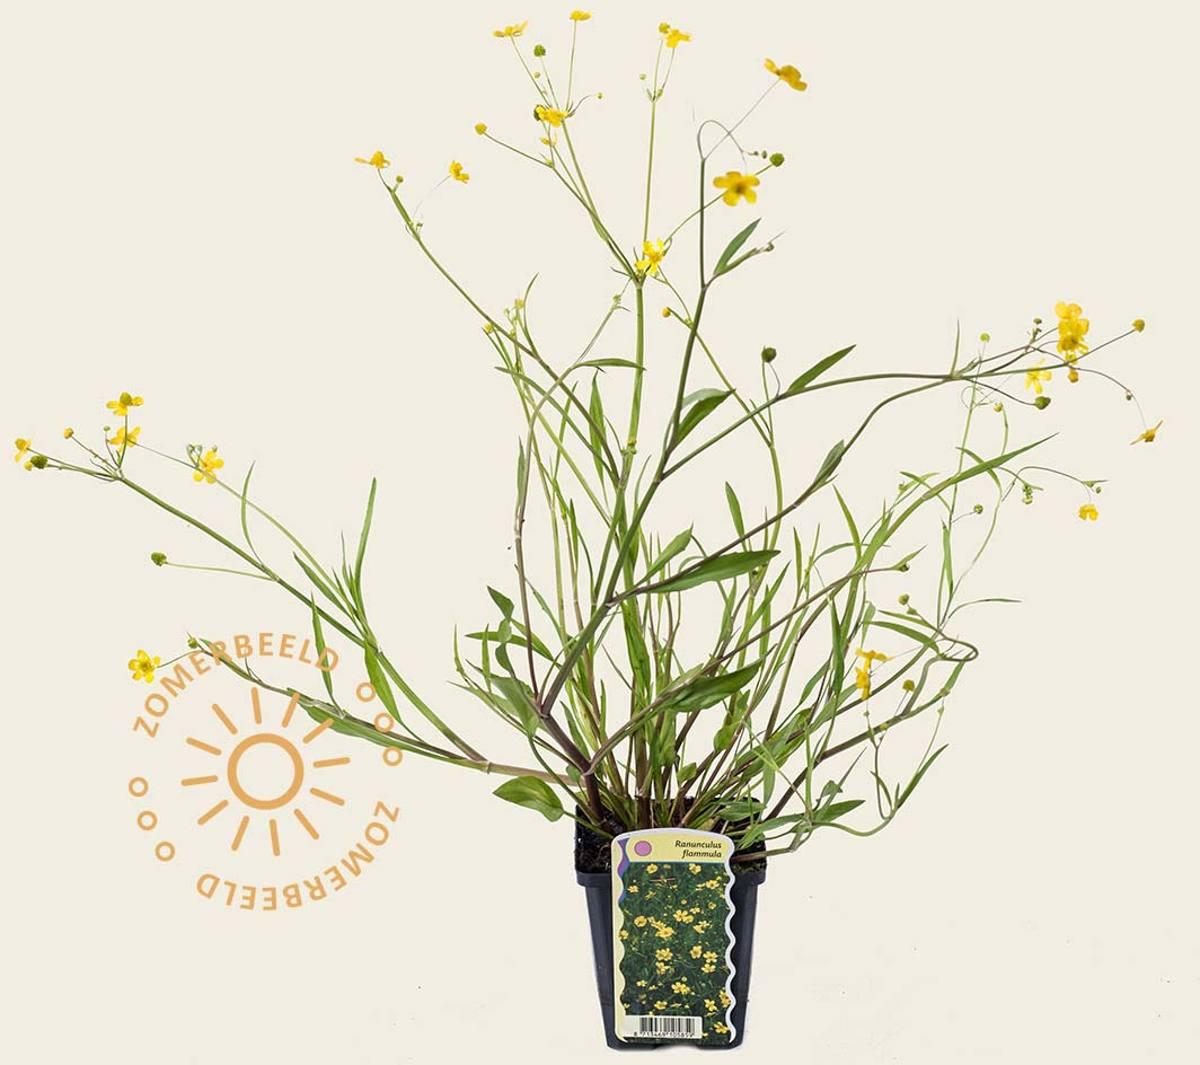 Ranunculus flammula kopen